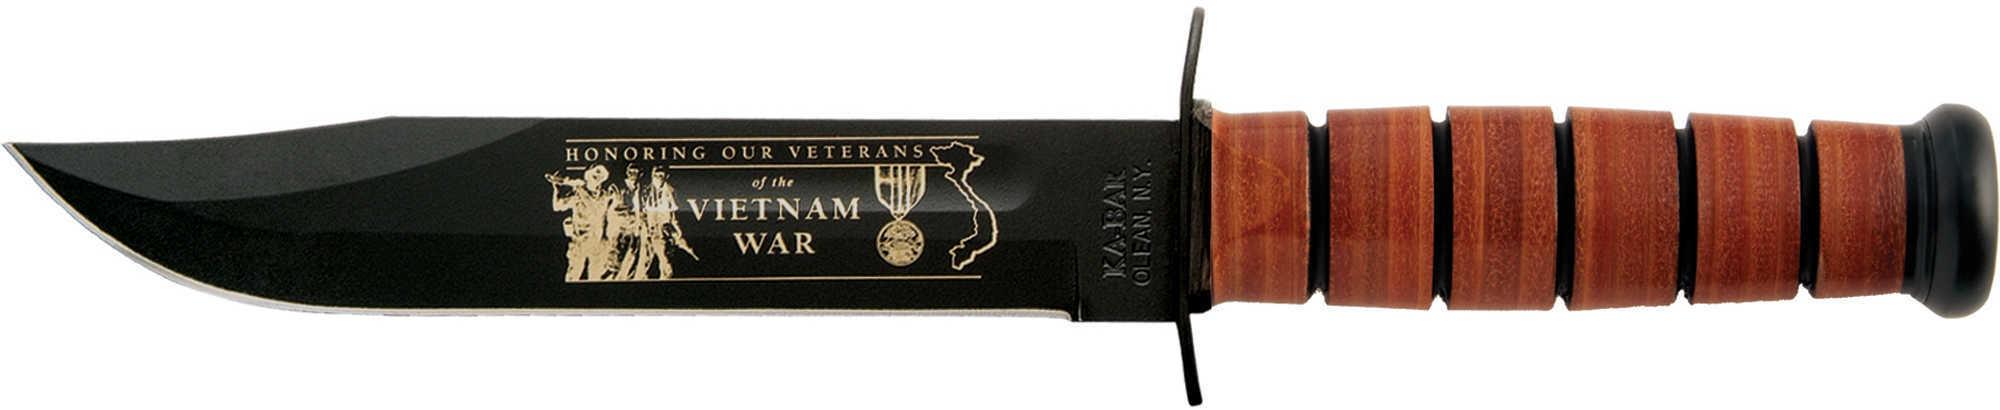 Ka-Bar Commemorative Knife US Army, Vietnam Md: 9139